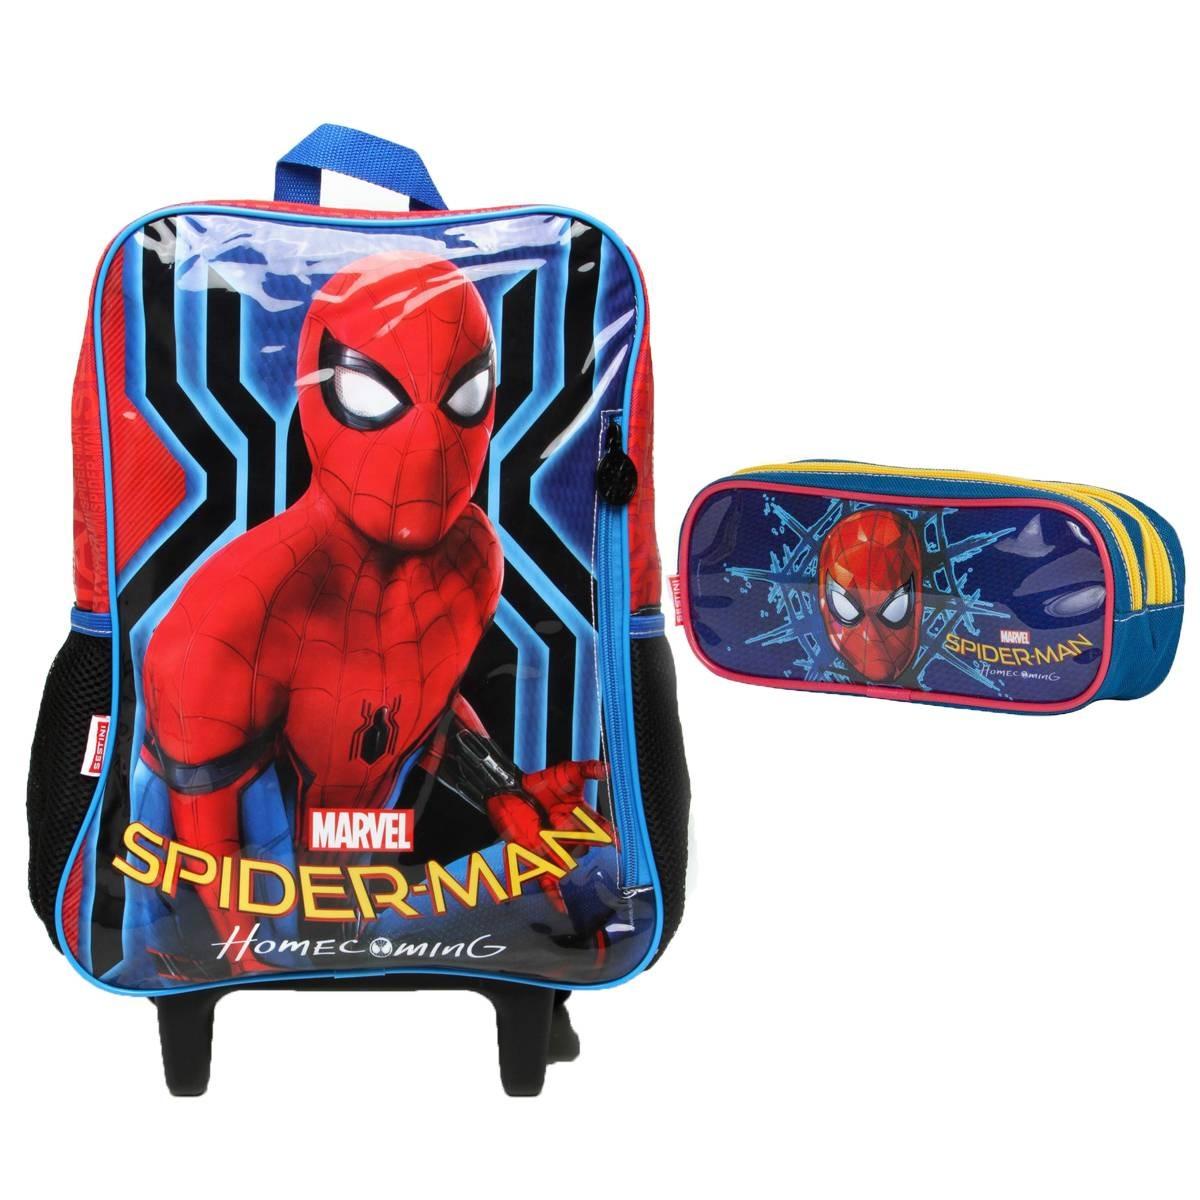 53e593c0a Kit Mochilete E Estojo Spider-man Marvel - Sestini 065061-00 - R ...